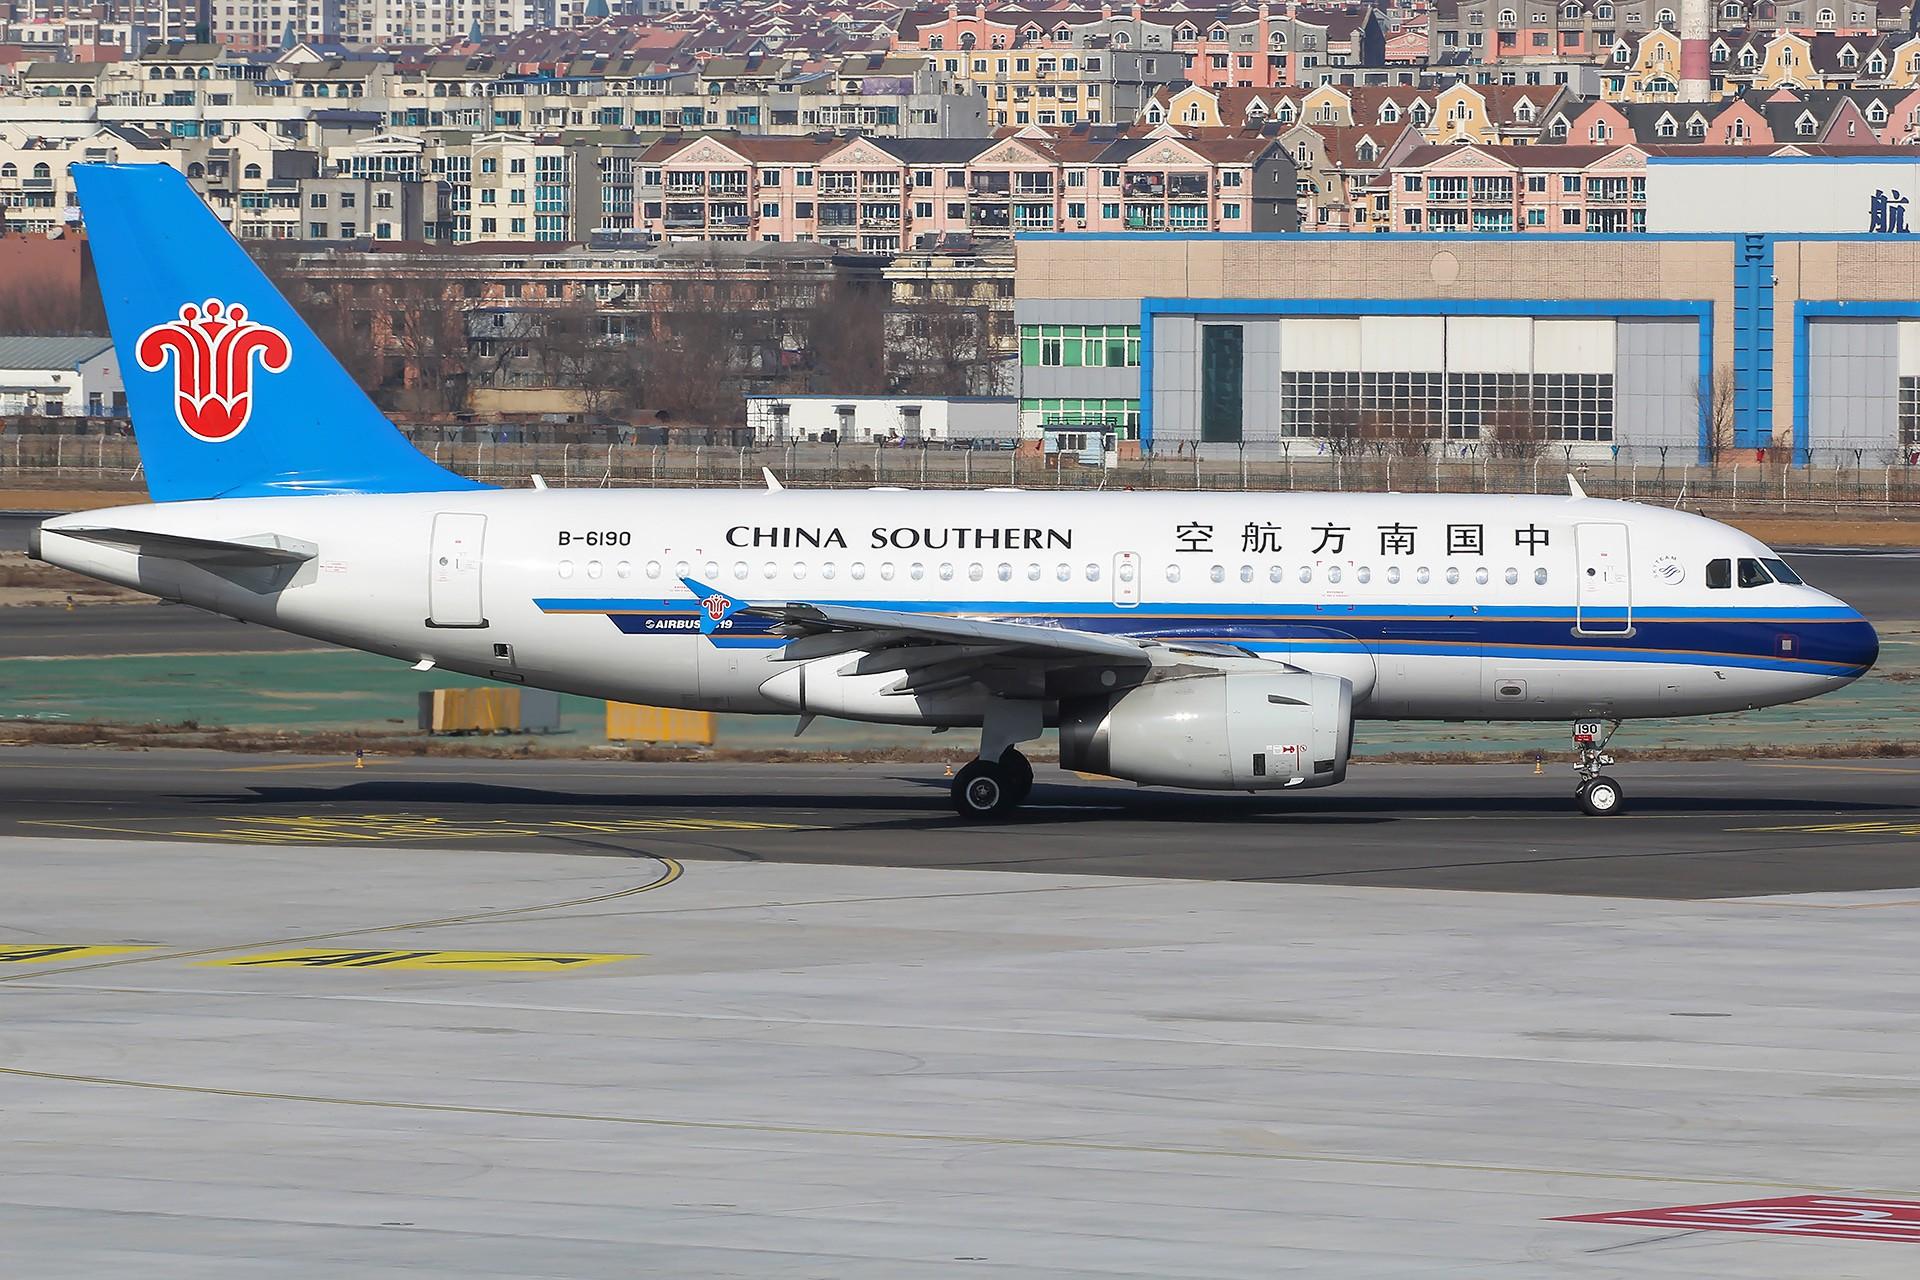 Re:[原创][原创][DLC]。。。绚丽甘肃 + 大美青海。。。 AIRBUS A319-100 B-6190 中国大连国际机场